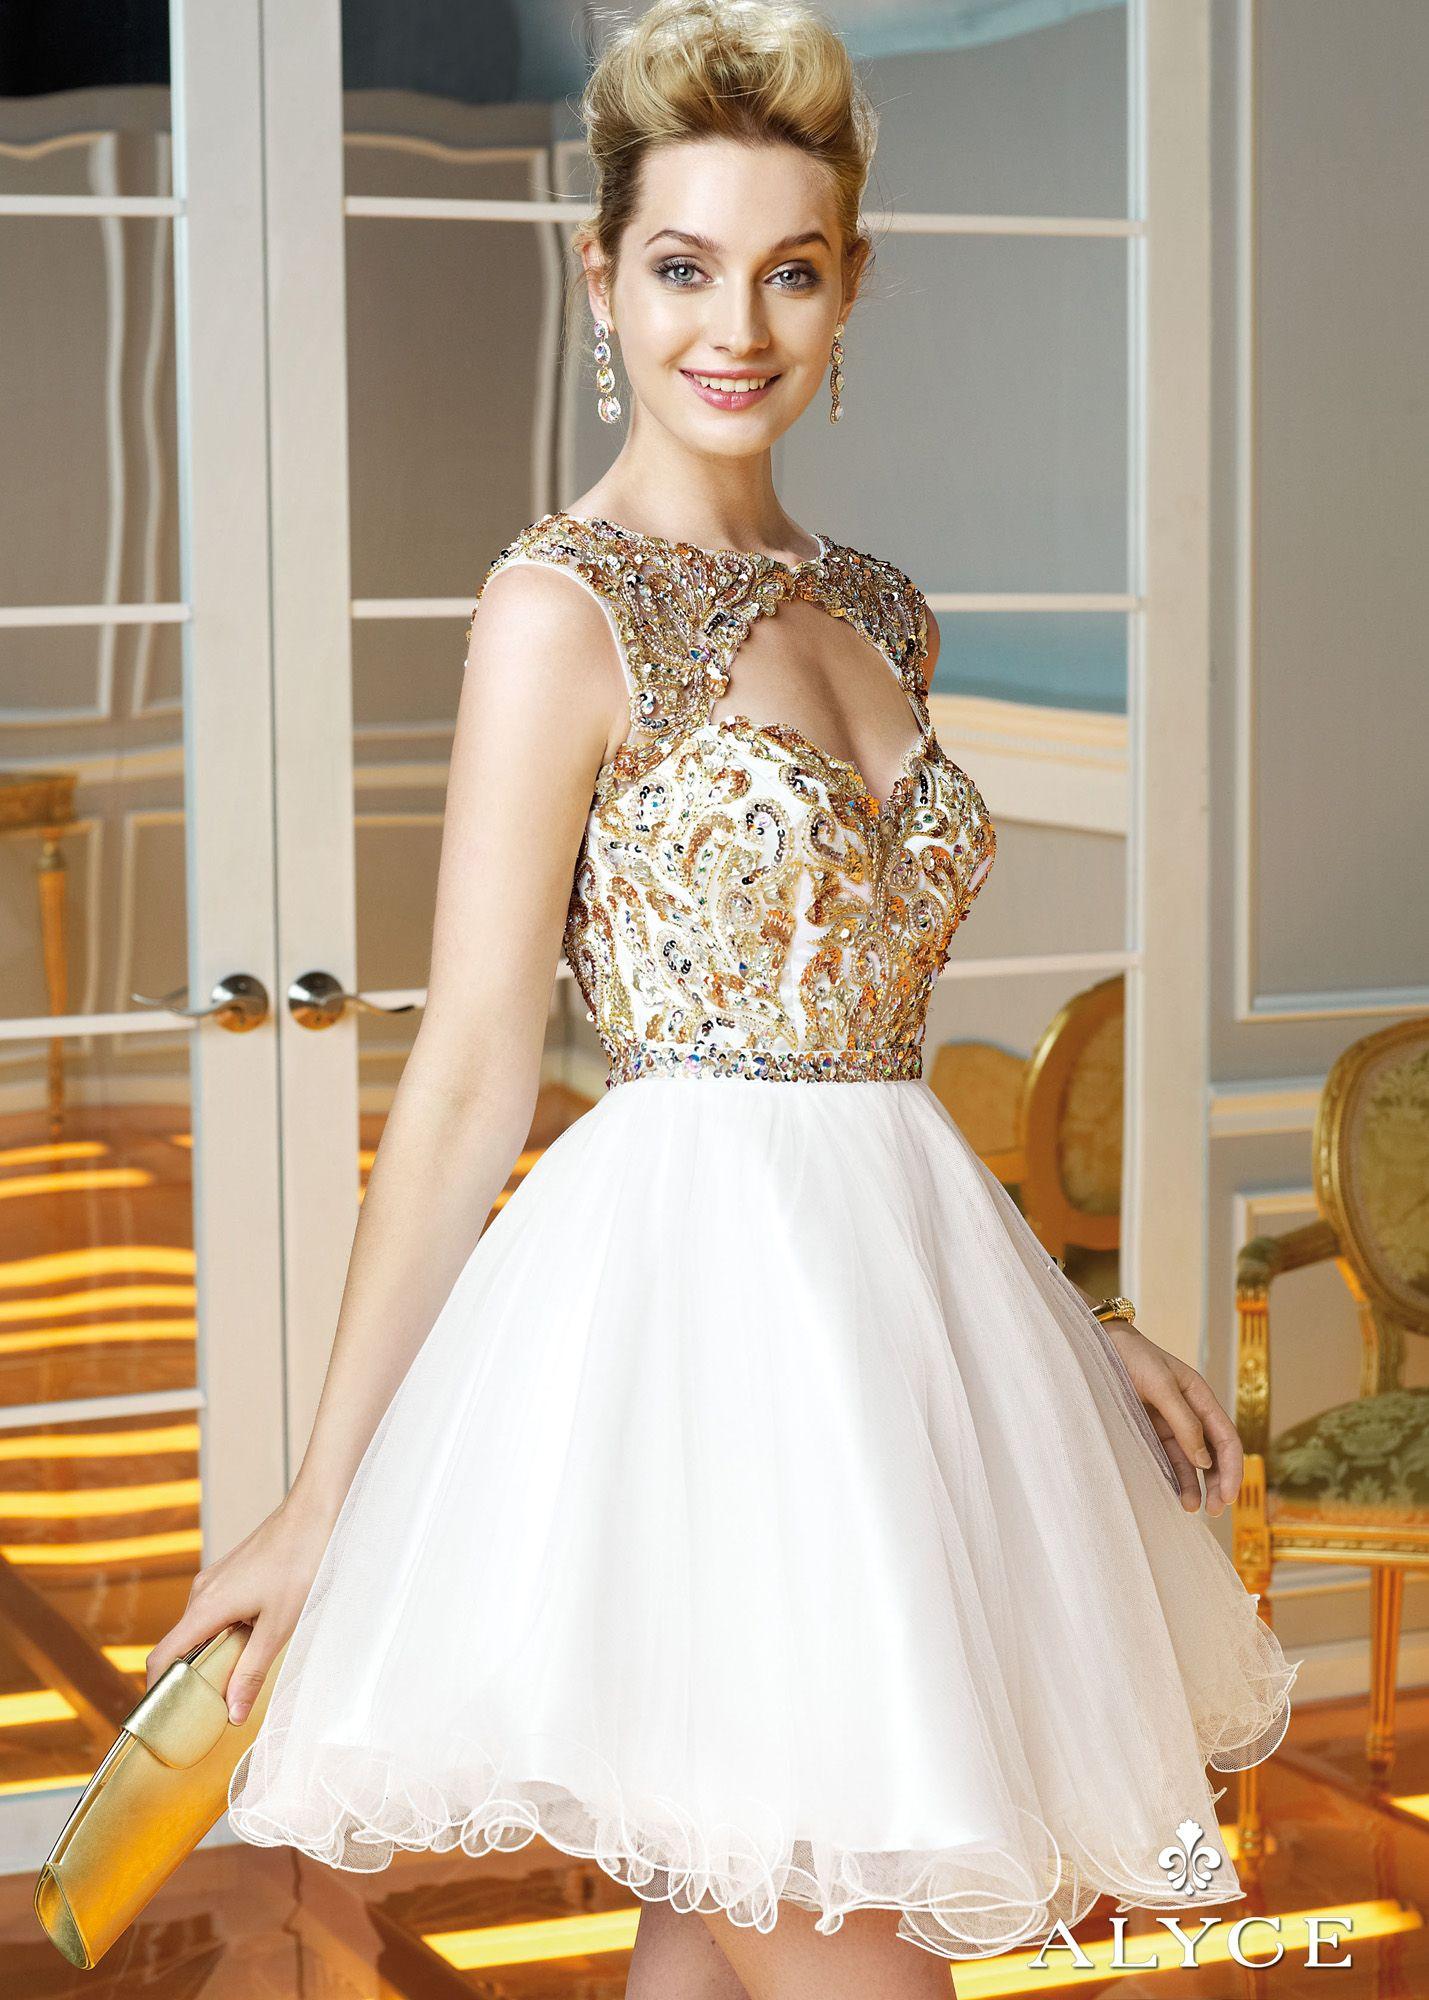 Alyce Paris 3583 - White/Gold Beaded Open Back Sweet 16 Dresses ...